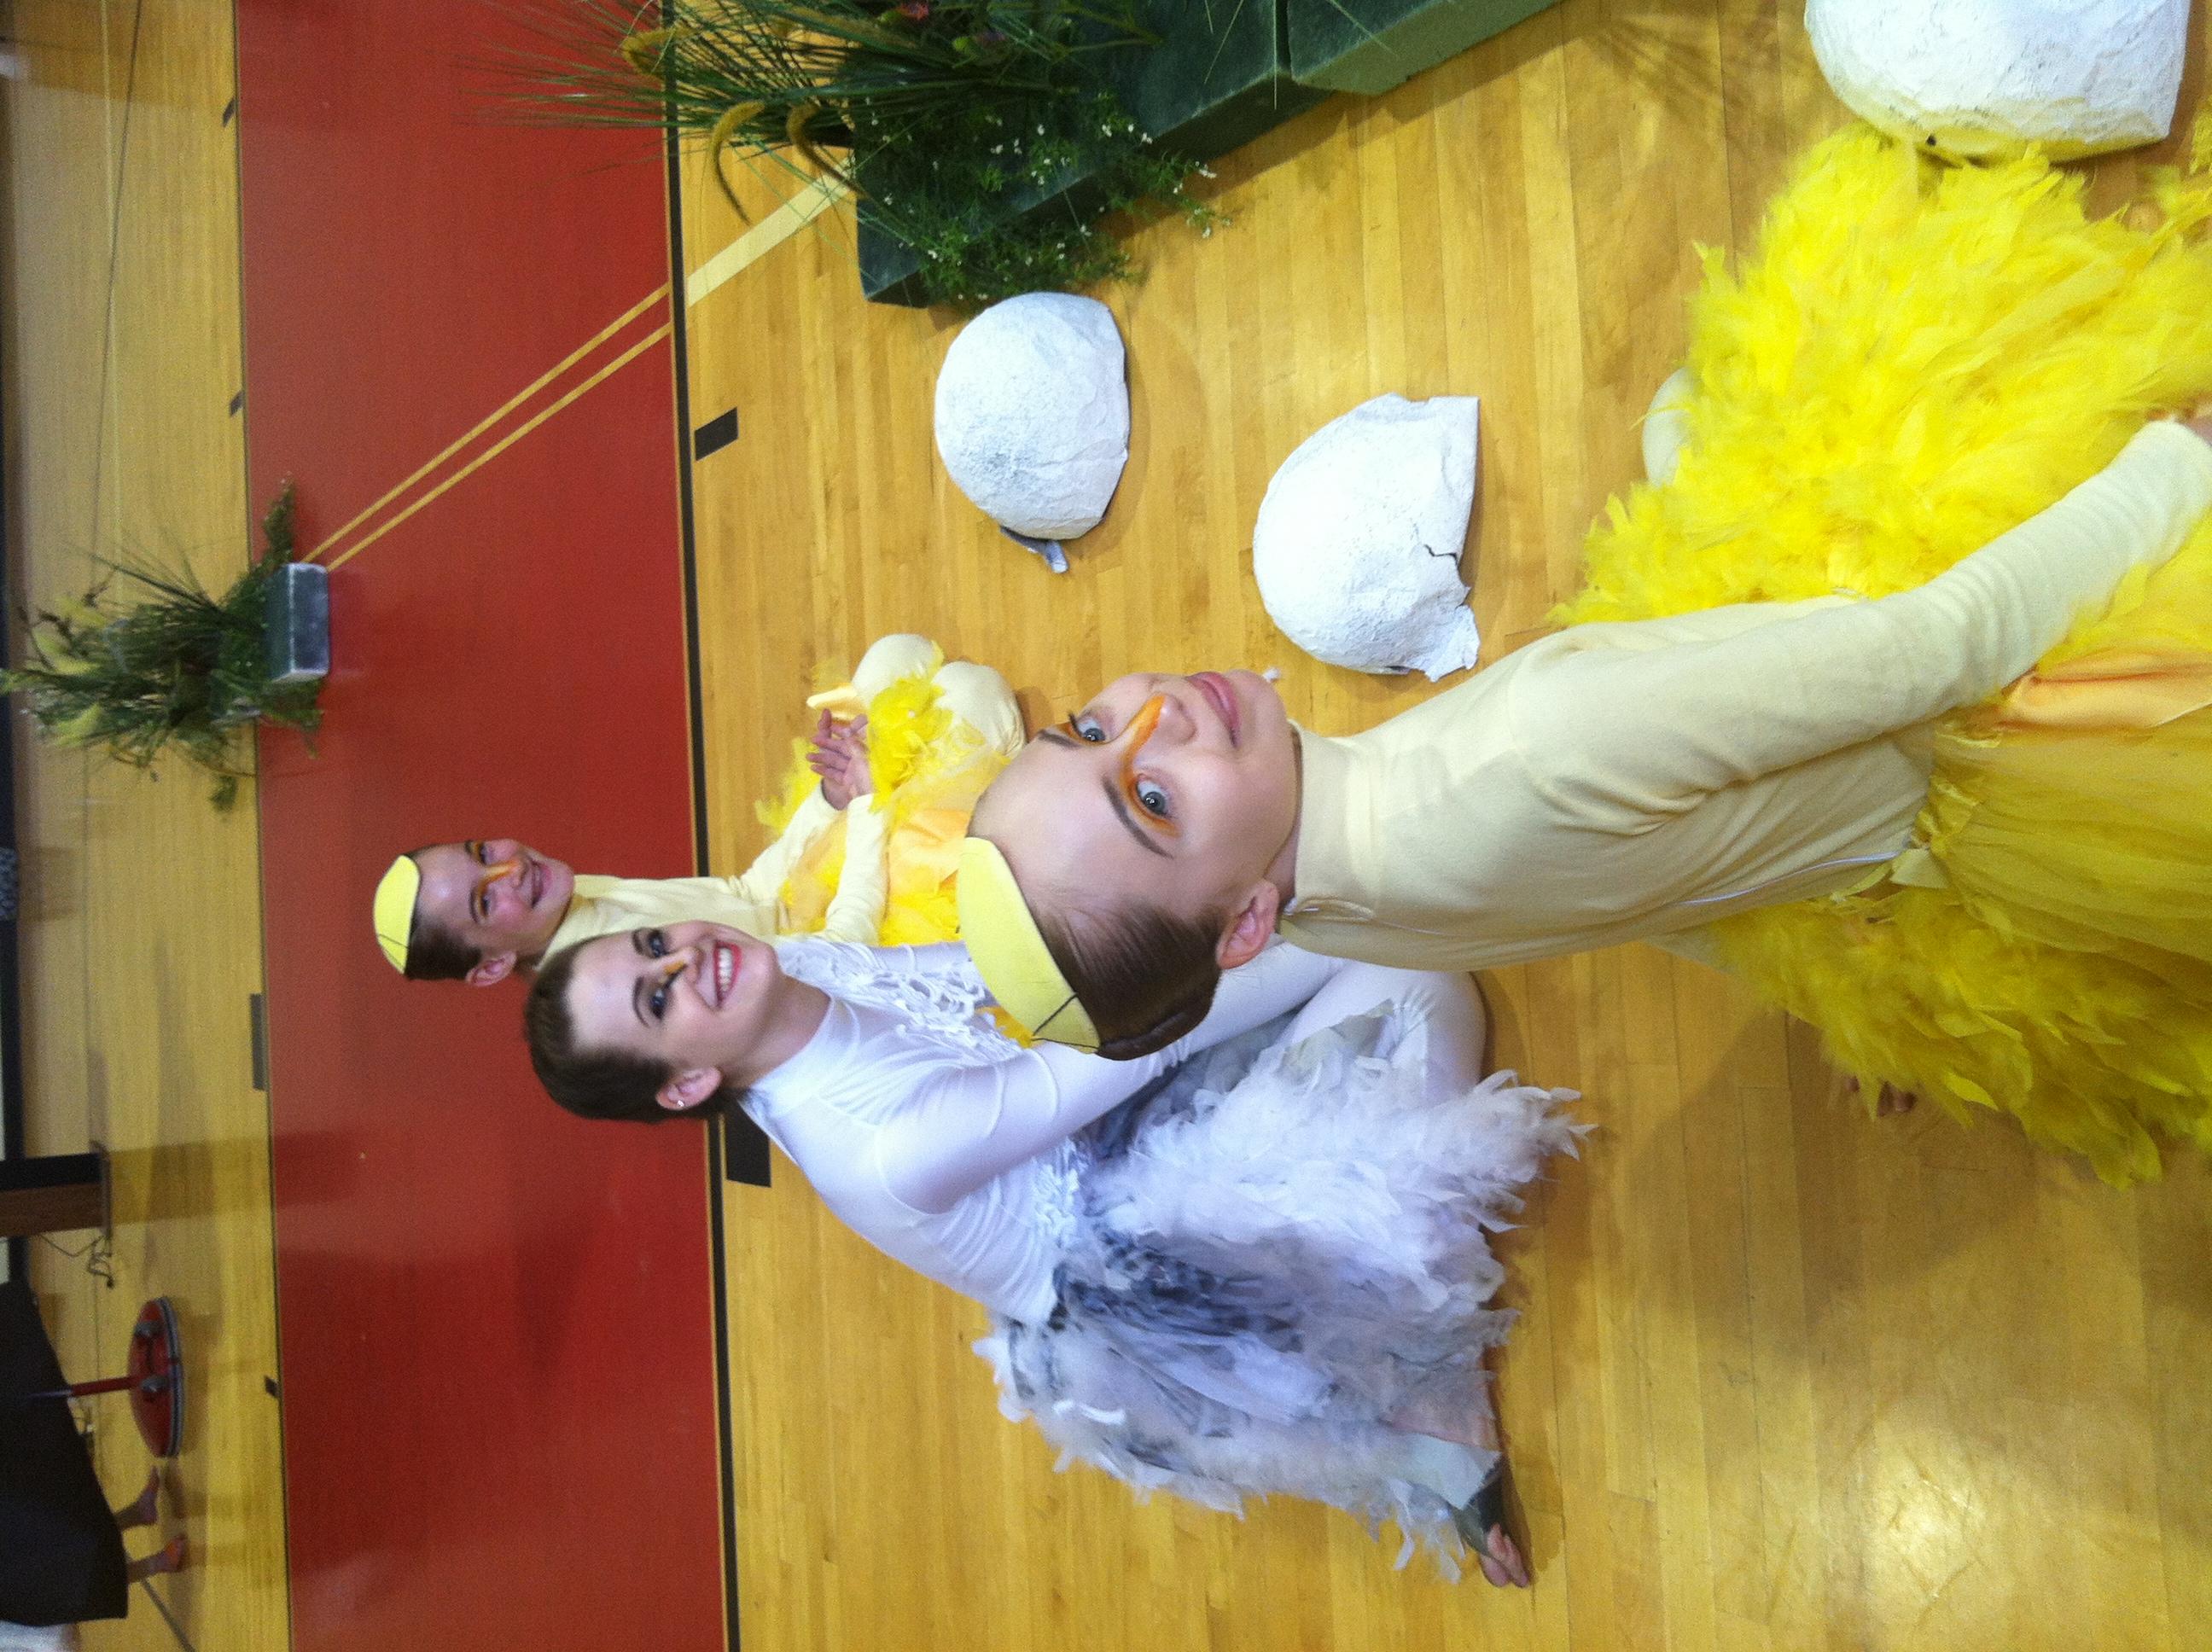 Pennsylvania Regional Ballet dancers waiting to begin an Ugly Duckling performance